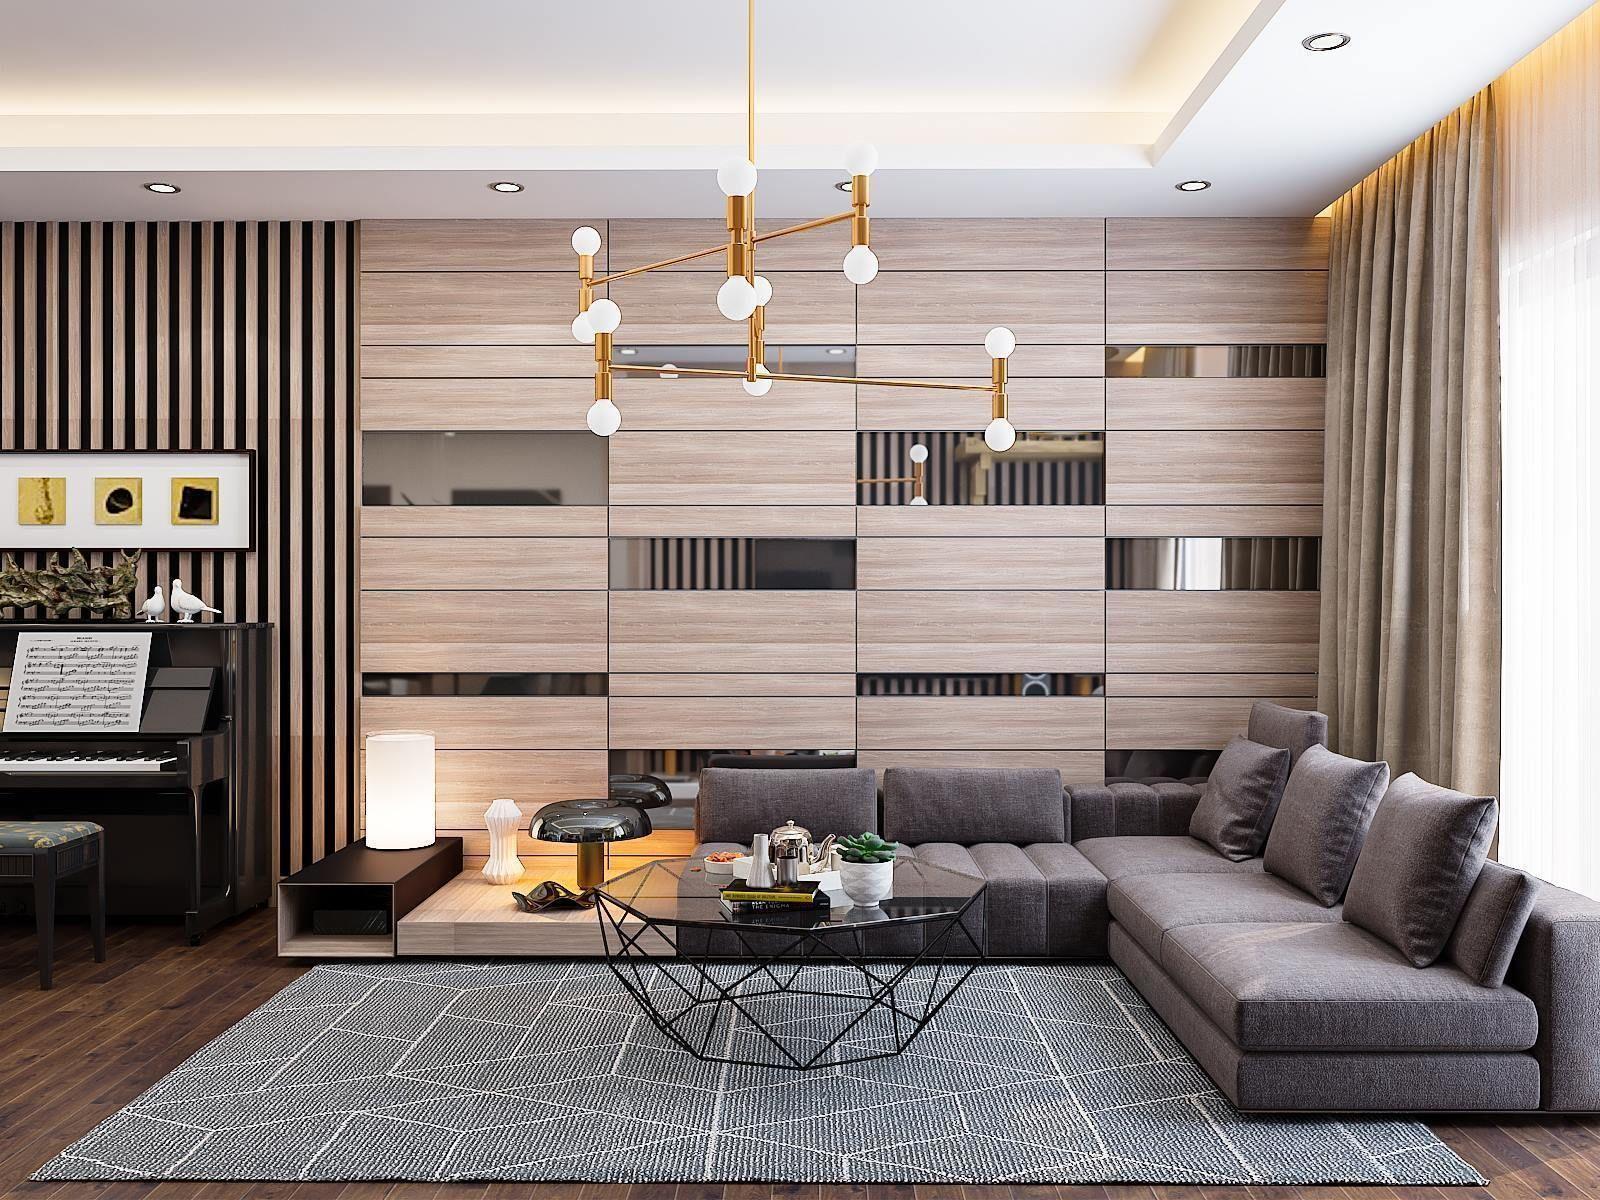 Apartment- Living room hall kichen scene 3D model 3D model